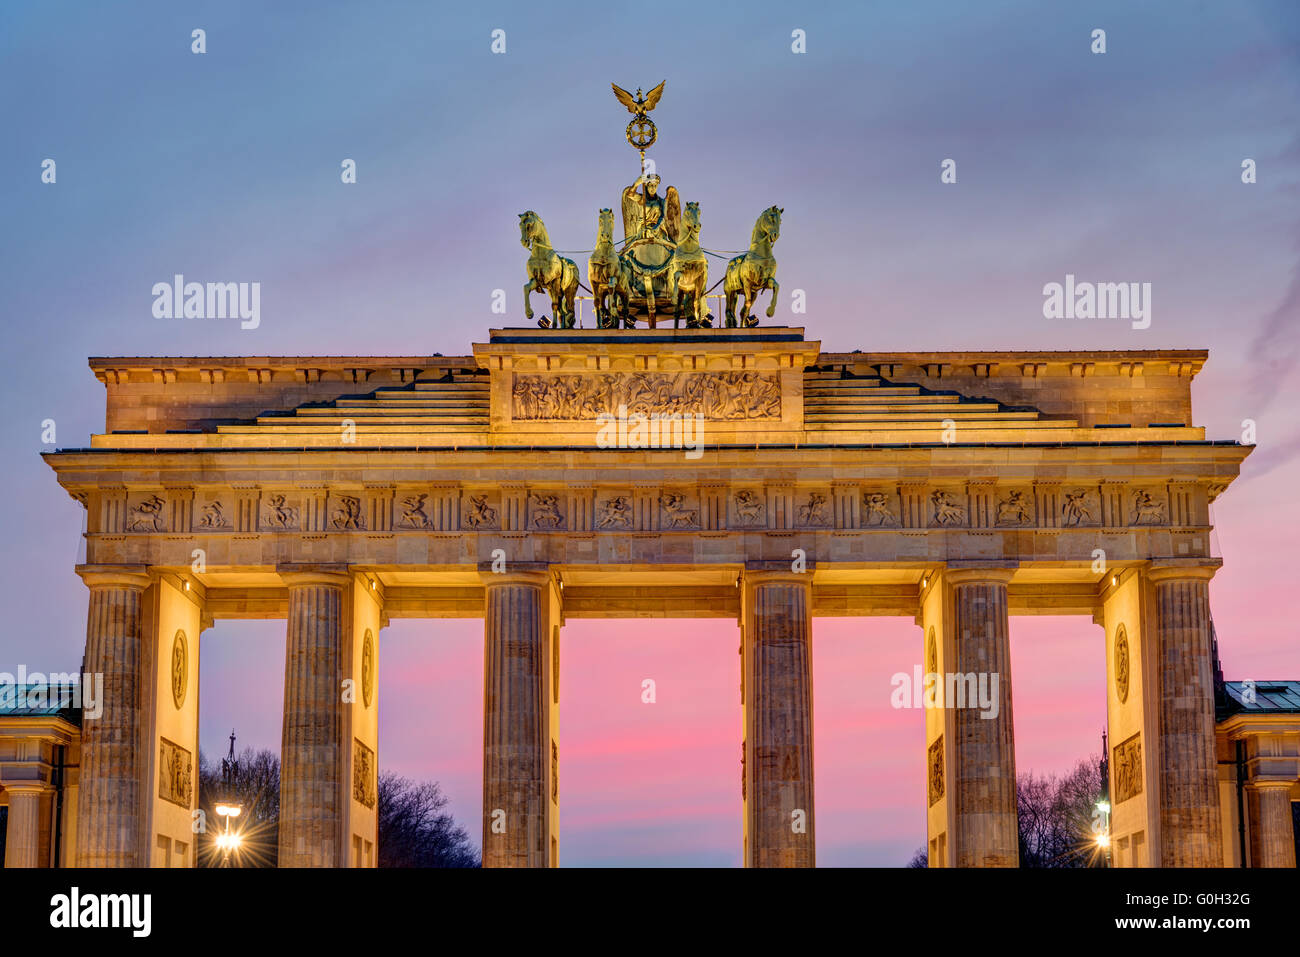 Das Brandenburger Tor in Berlin nach Sonnenuntergang Stockbild